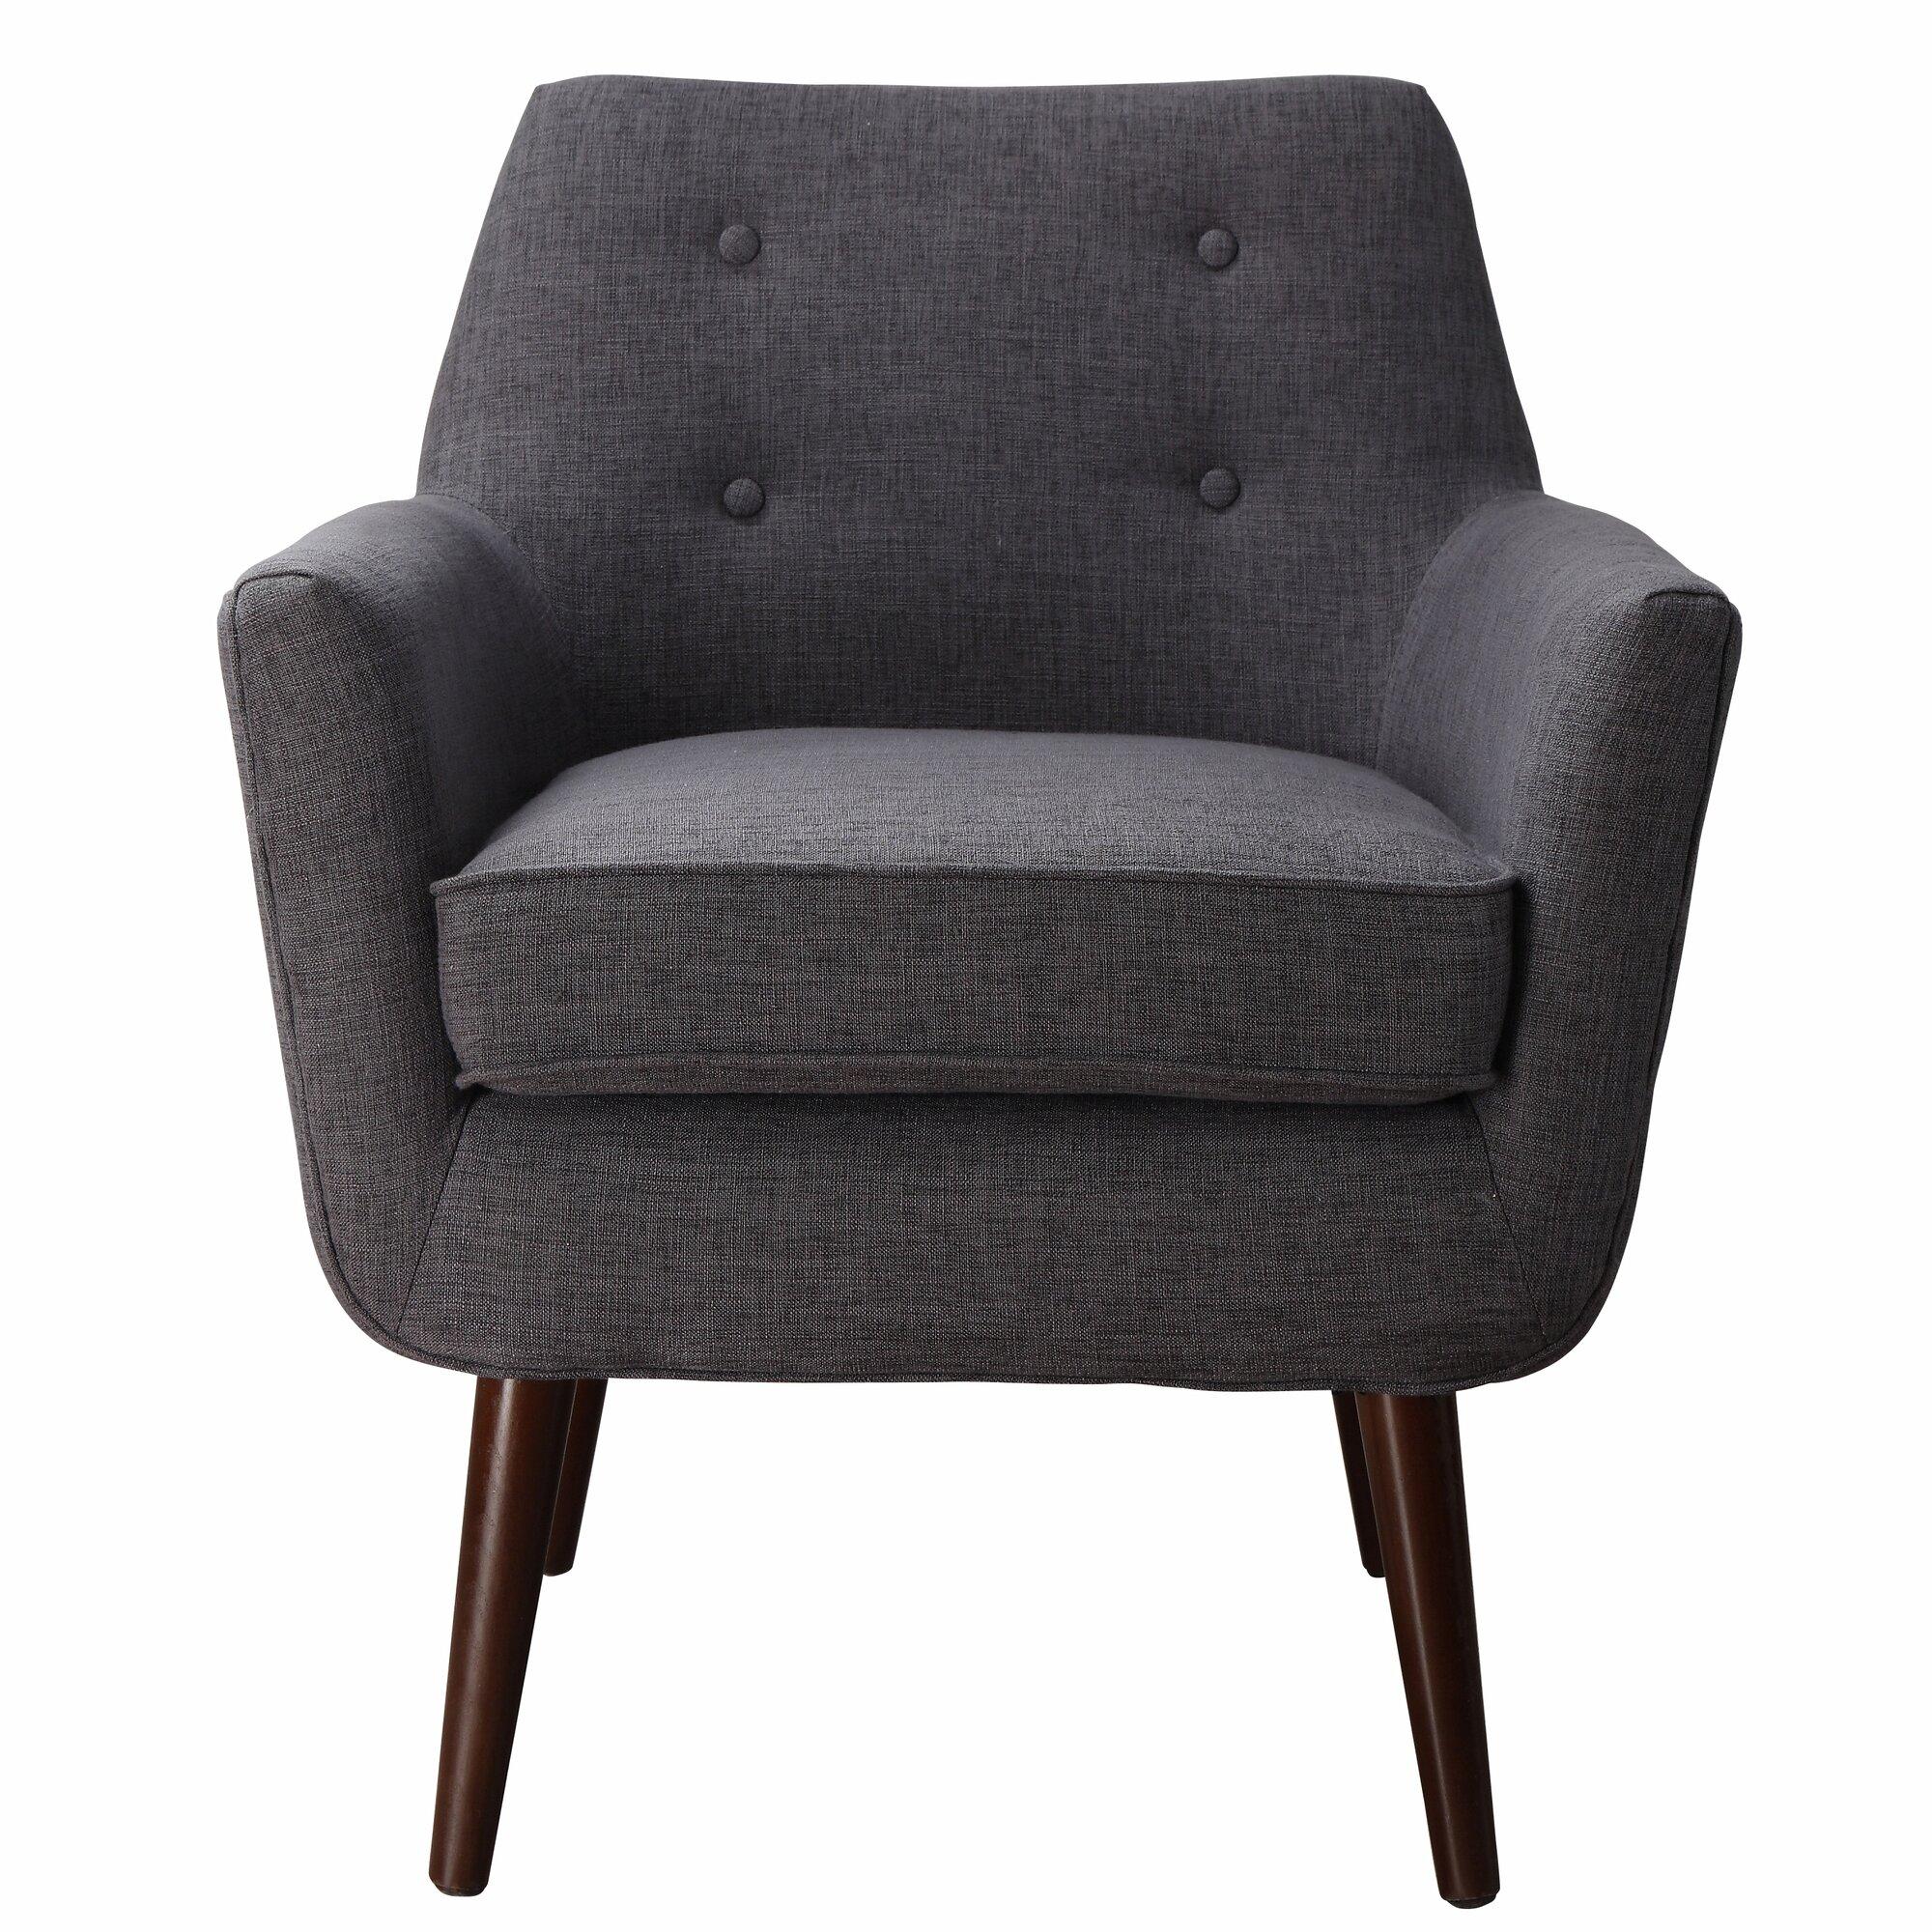 Comfortable arm chairs - Kalman Armchair